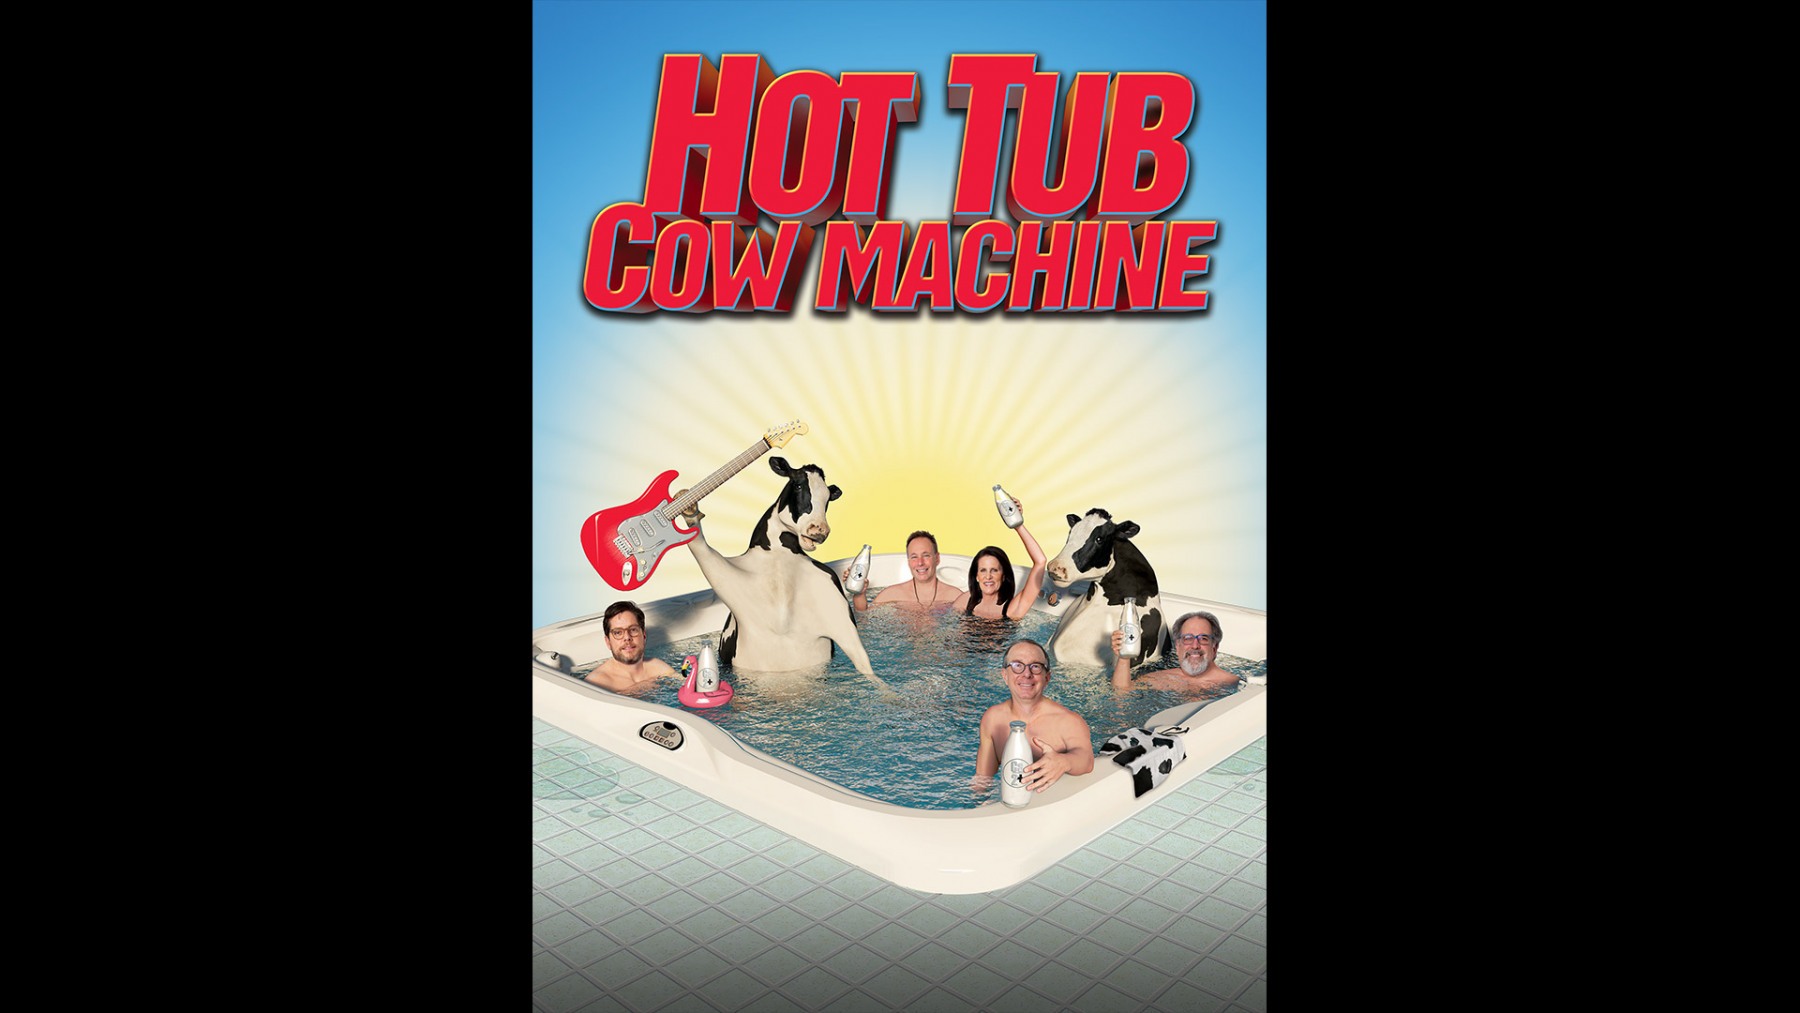 Hot Tub Cow Machine Poster